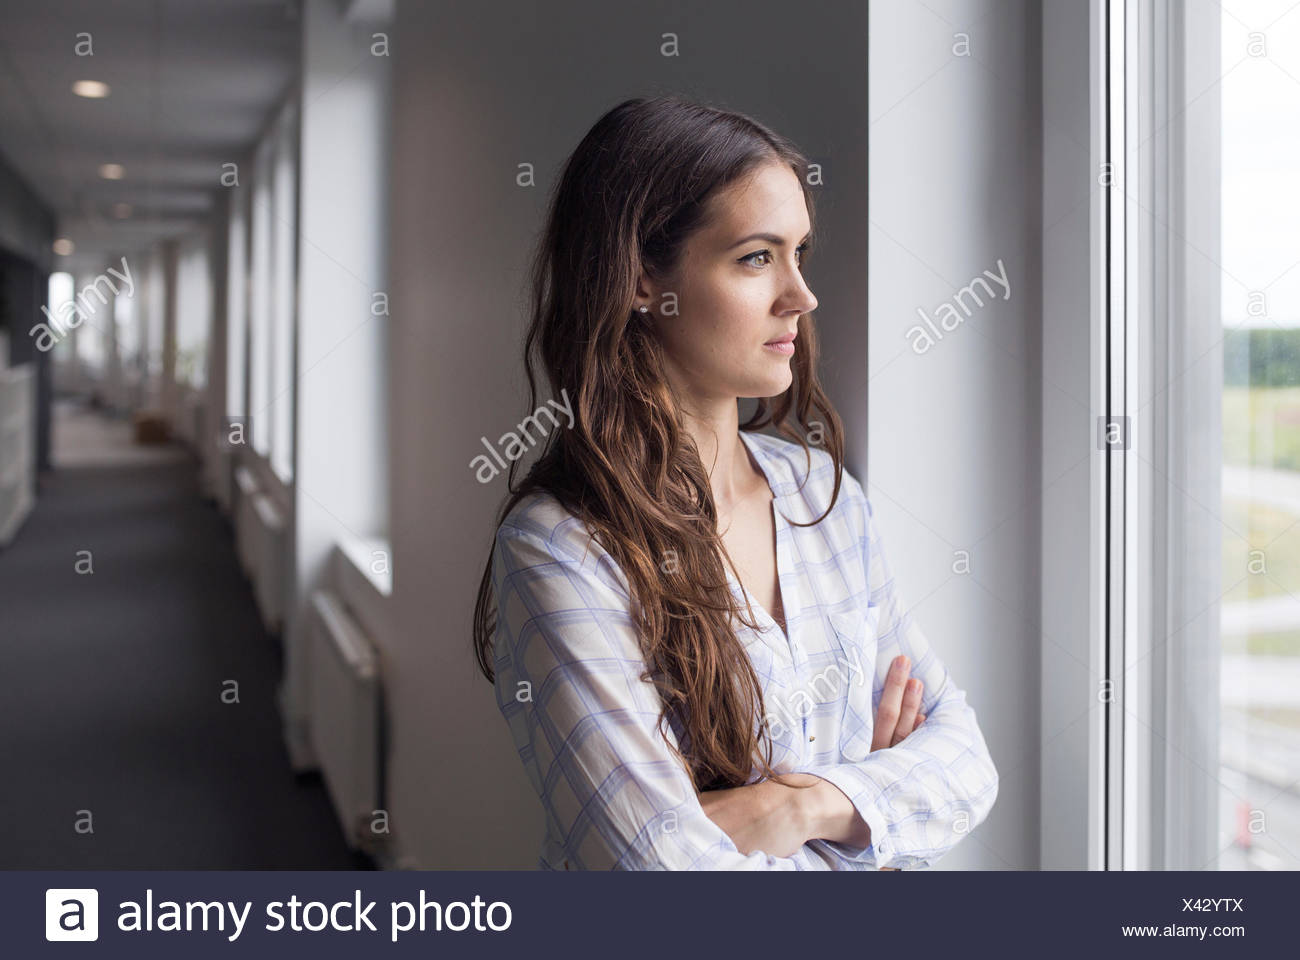 Female architect looking through window - Stock Image